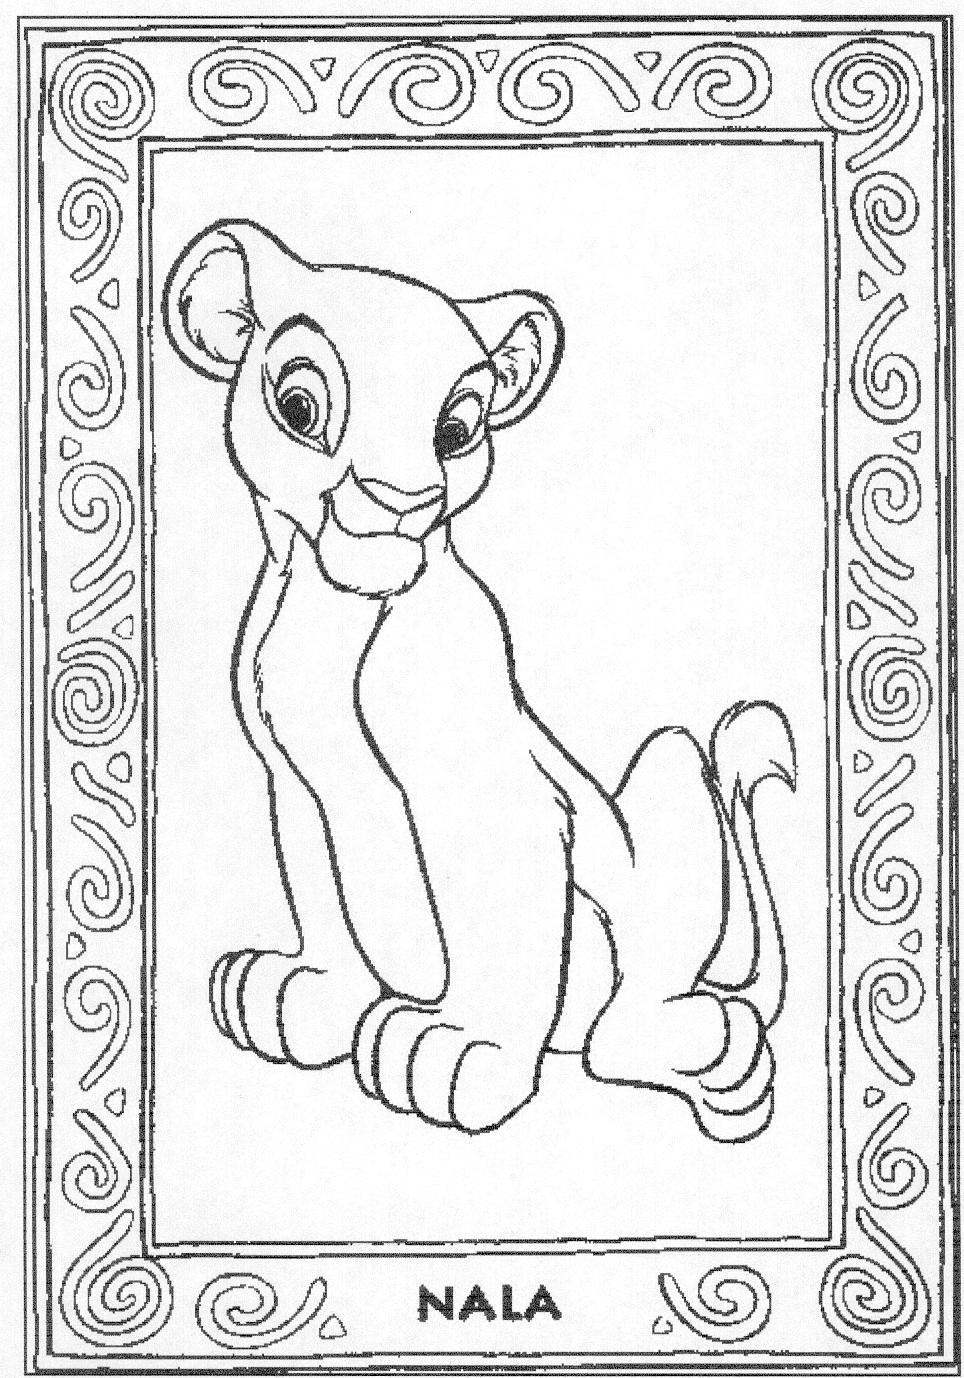 free lion king coloring pages simba and nala coloring pages  coloring home pages lion free king coloring